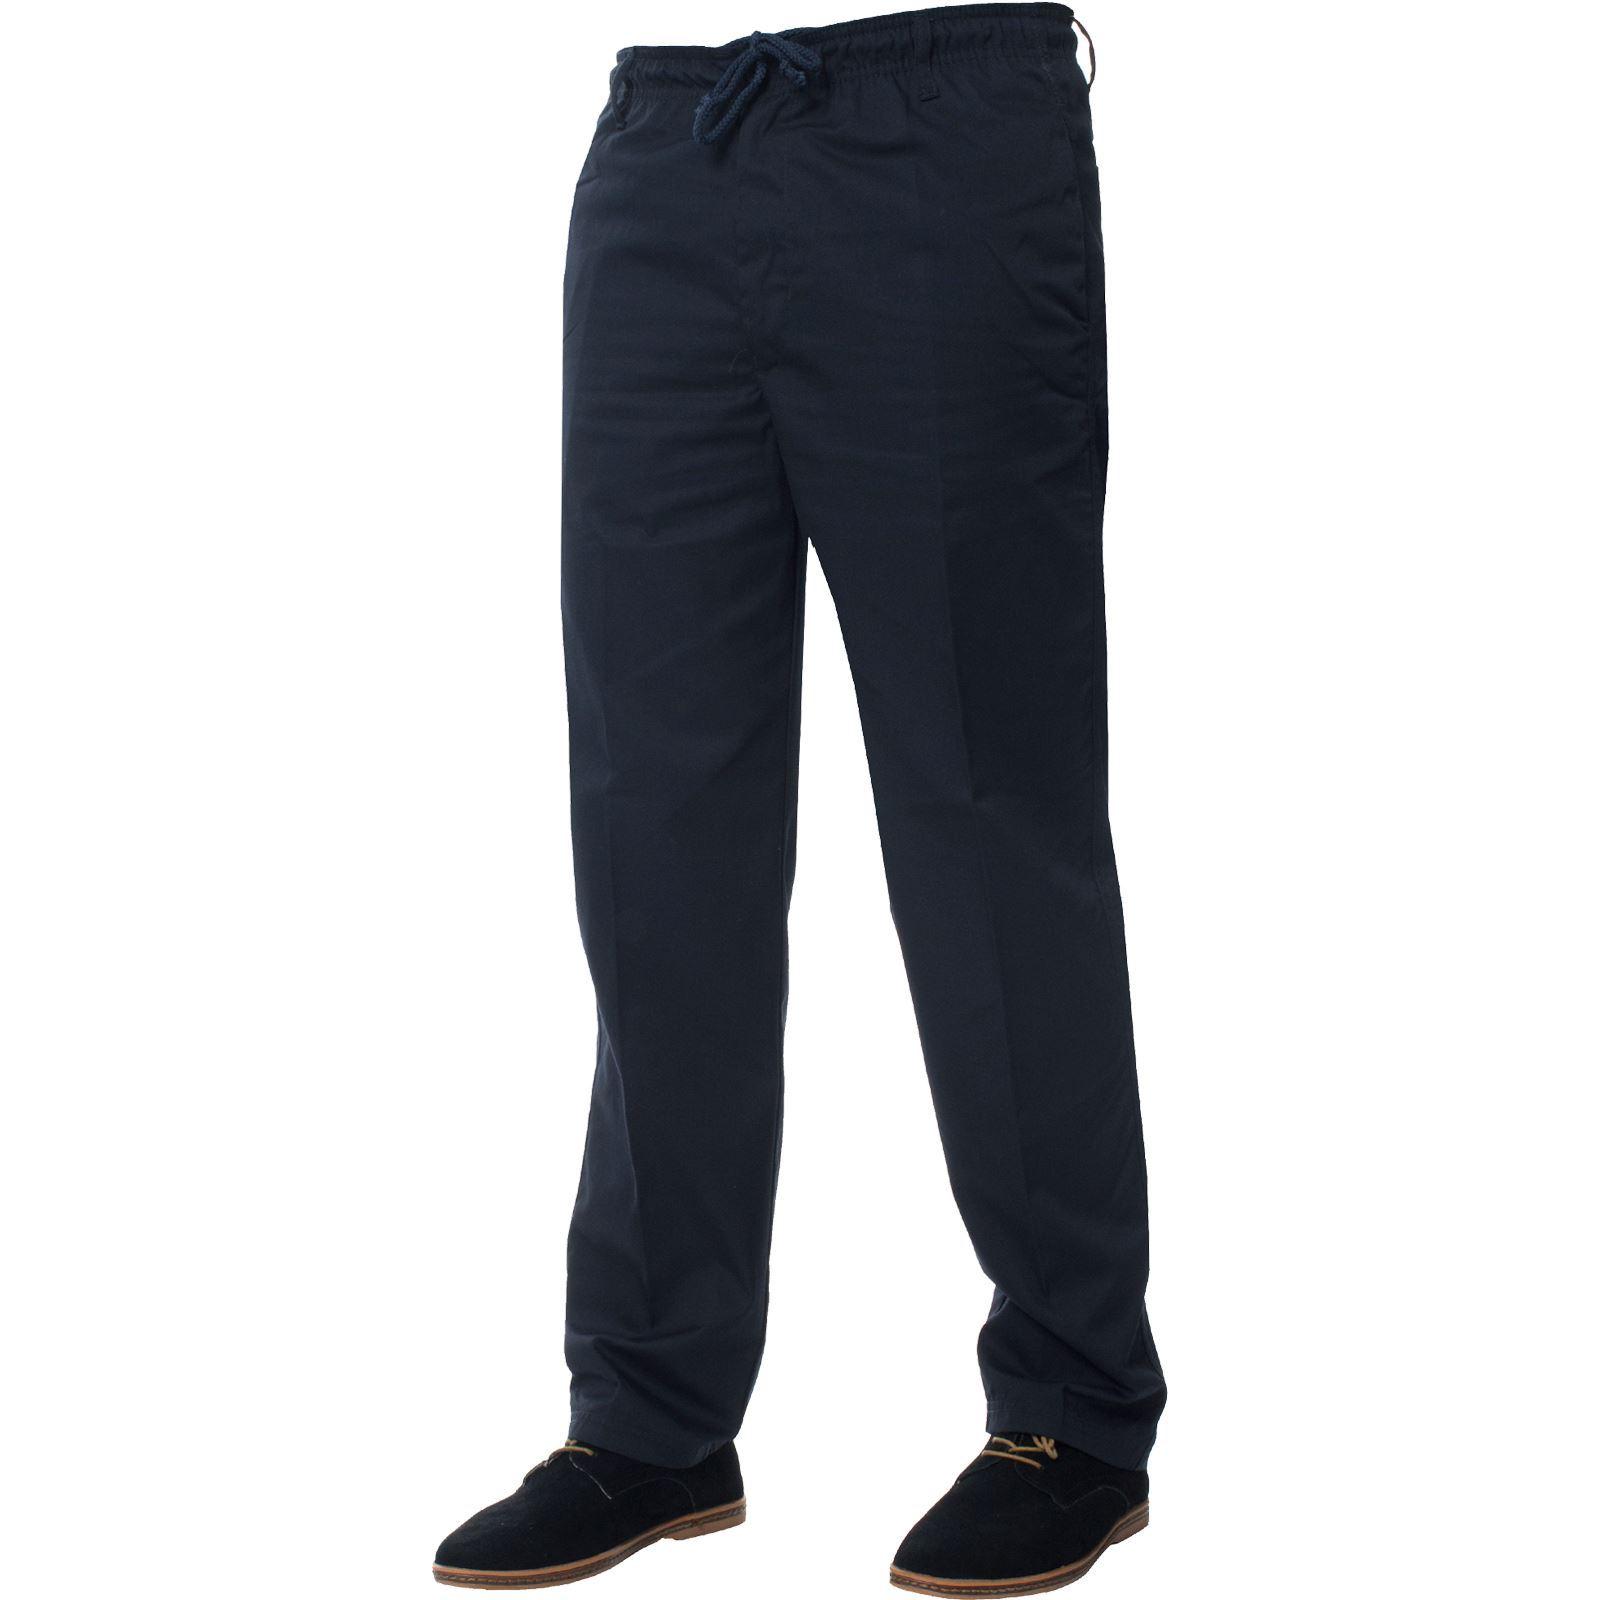 Para-Hombres-Pantalones-De-Rugby-Kruze-cintura-elastica-con-cordon-pantalones-REGULAR-King-Tamanos miniatura 10